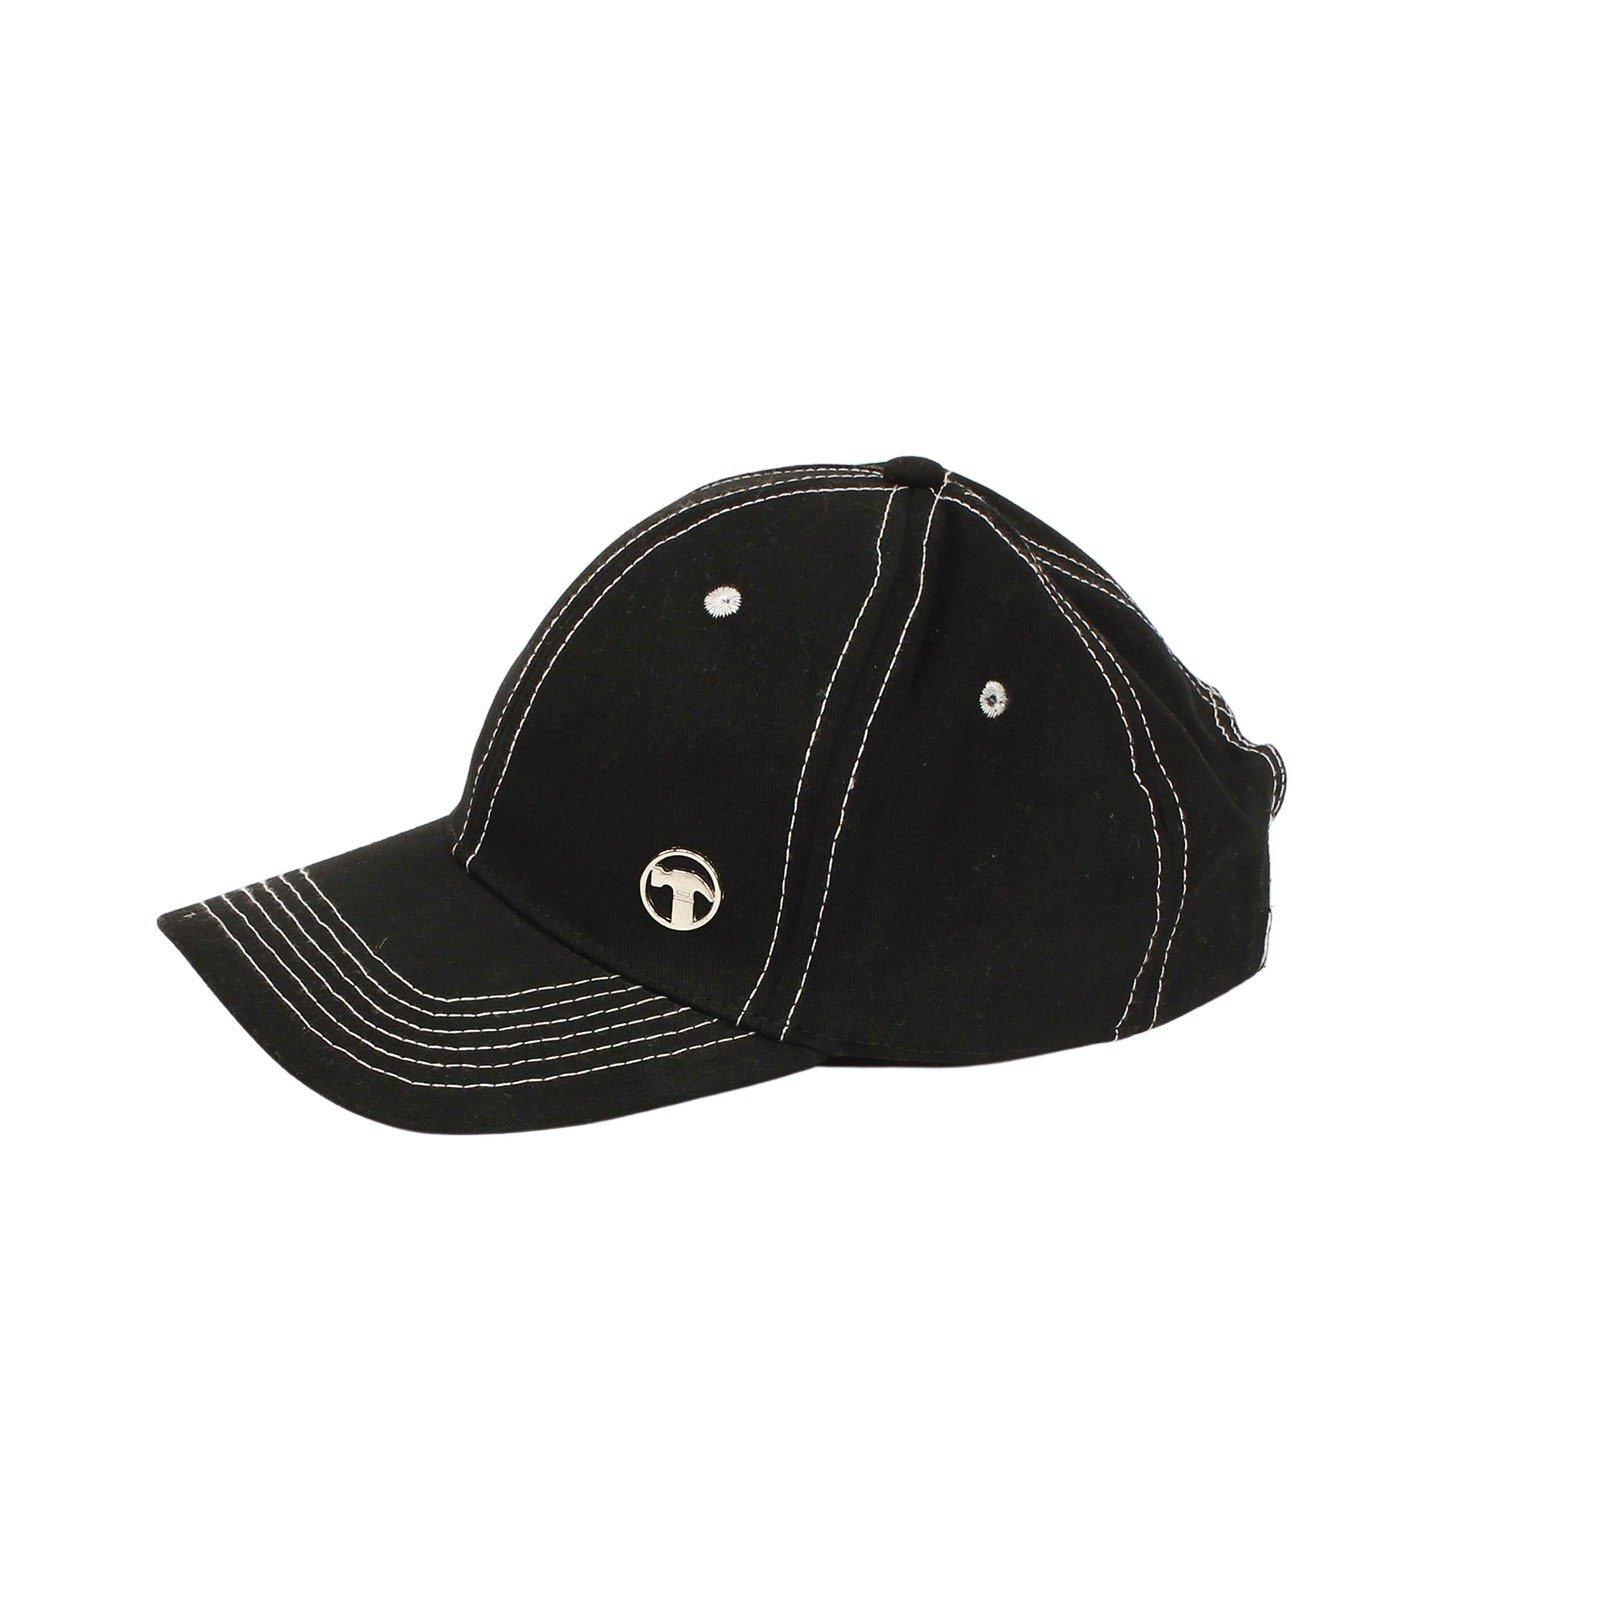 Bunnings Black Cap with Metal Pin